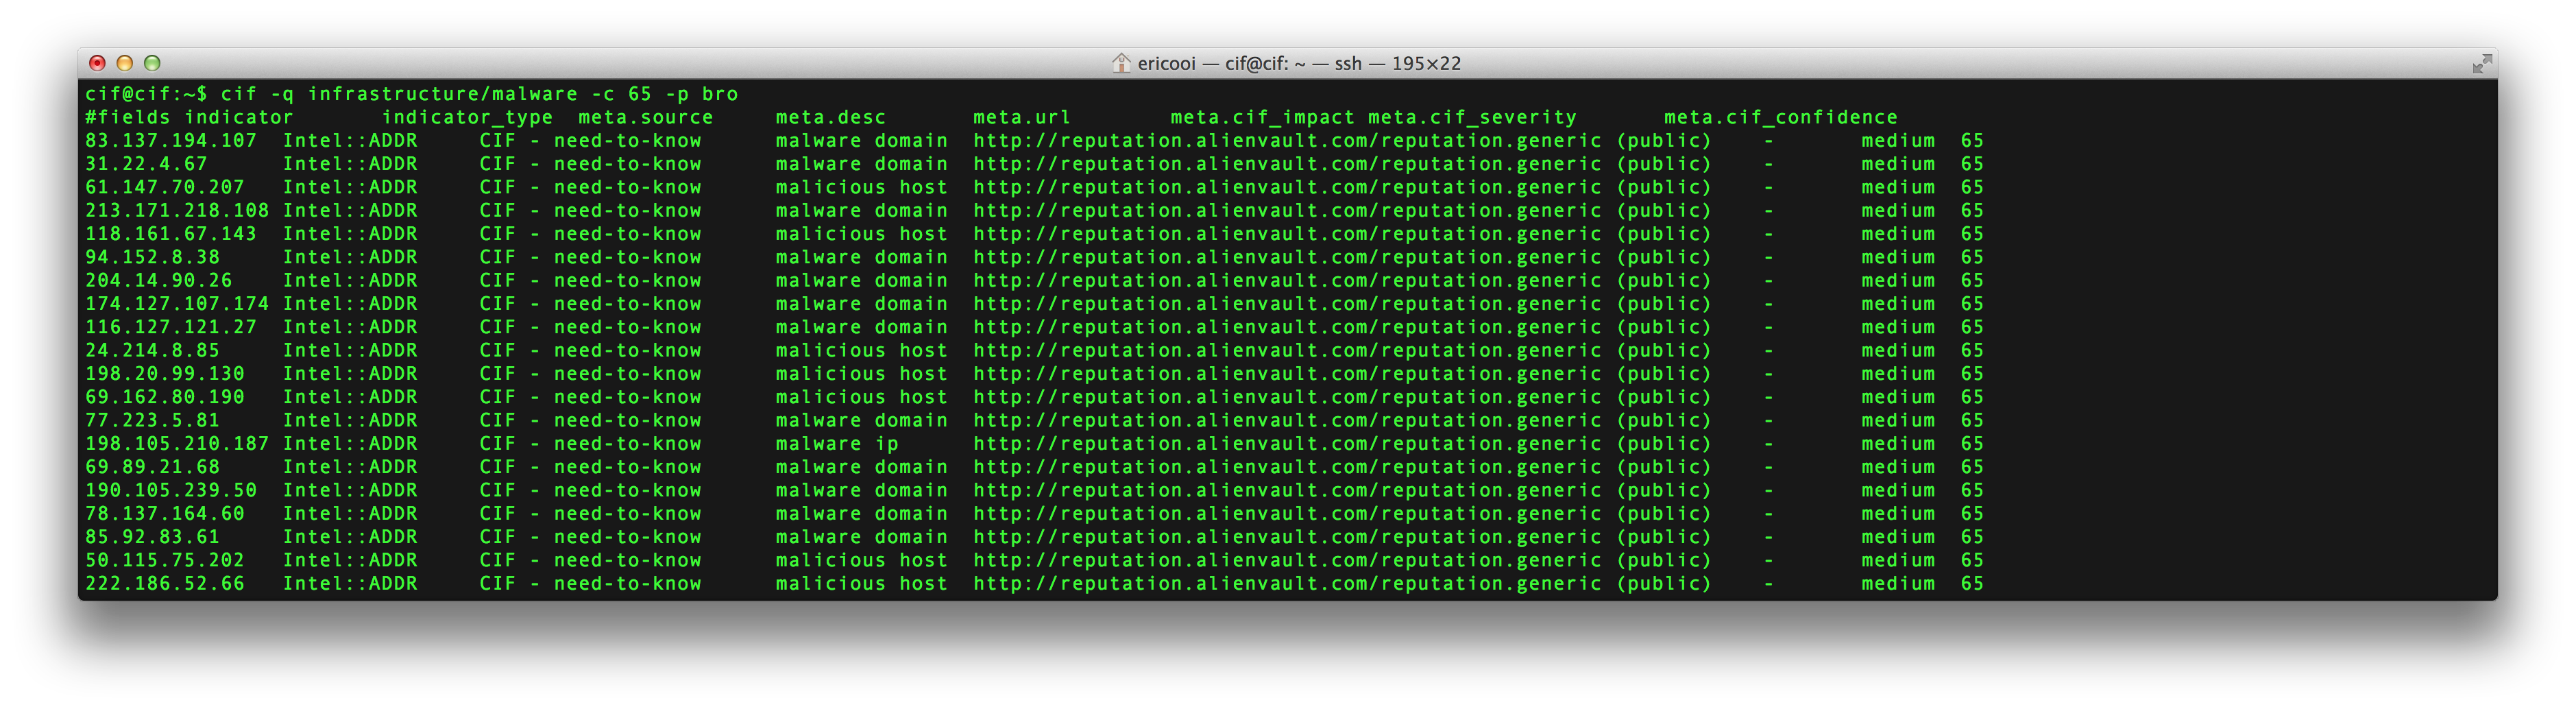 Malware IP Addresses (Bro): cif -q infrastructure/malware -c 65 -p bro